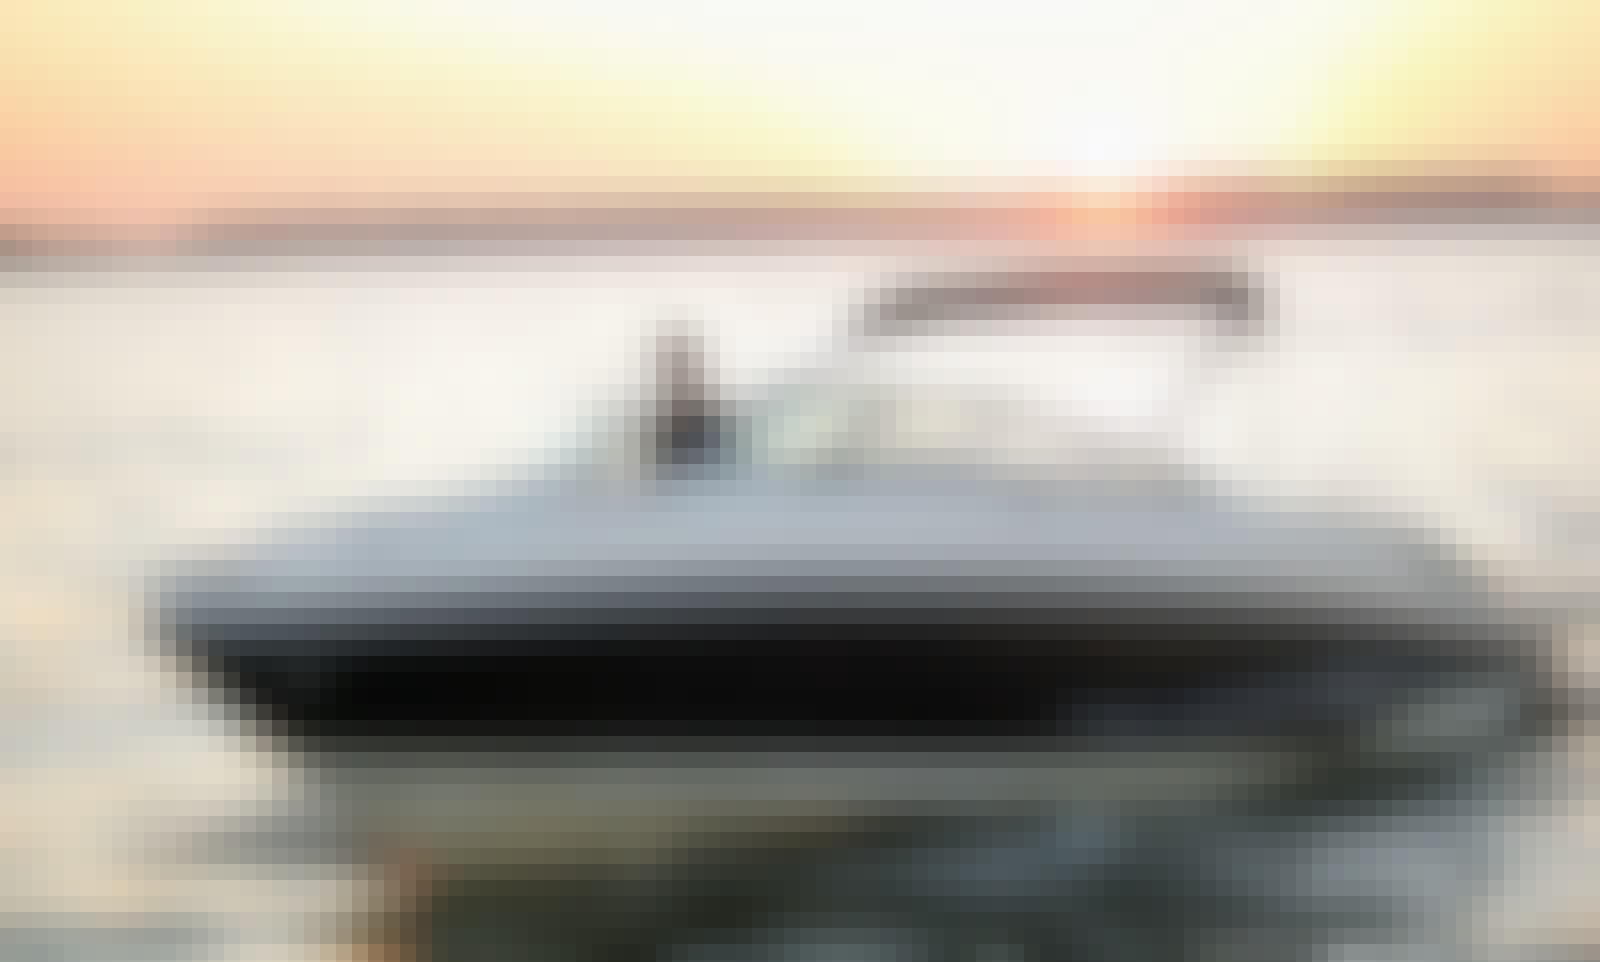 """VALHALA"" Rinker 246 Bow Rider rental in Sant Antoni de Portmany"